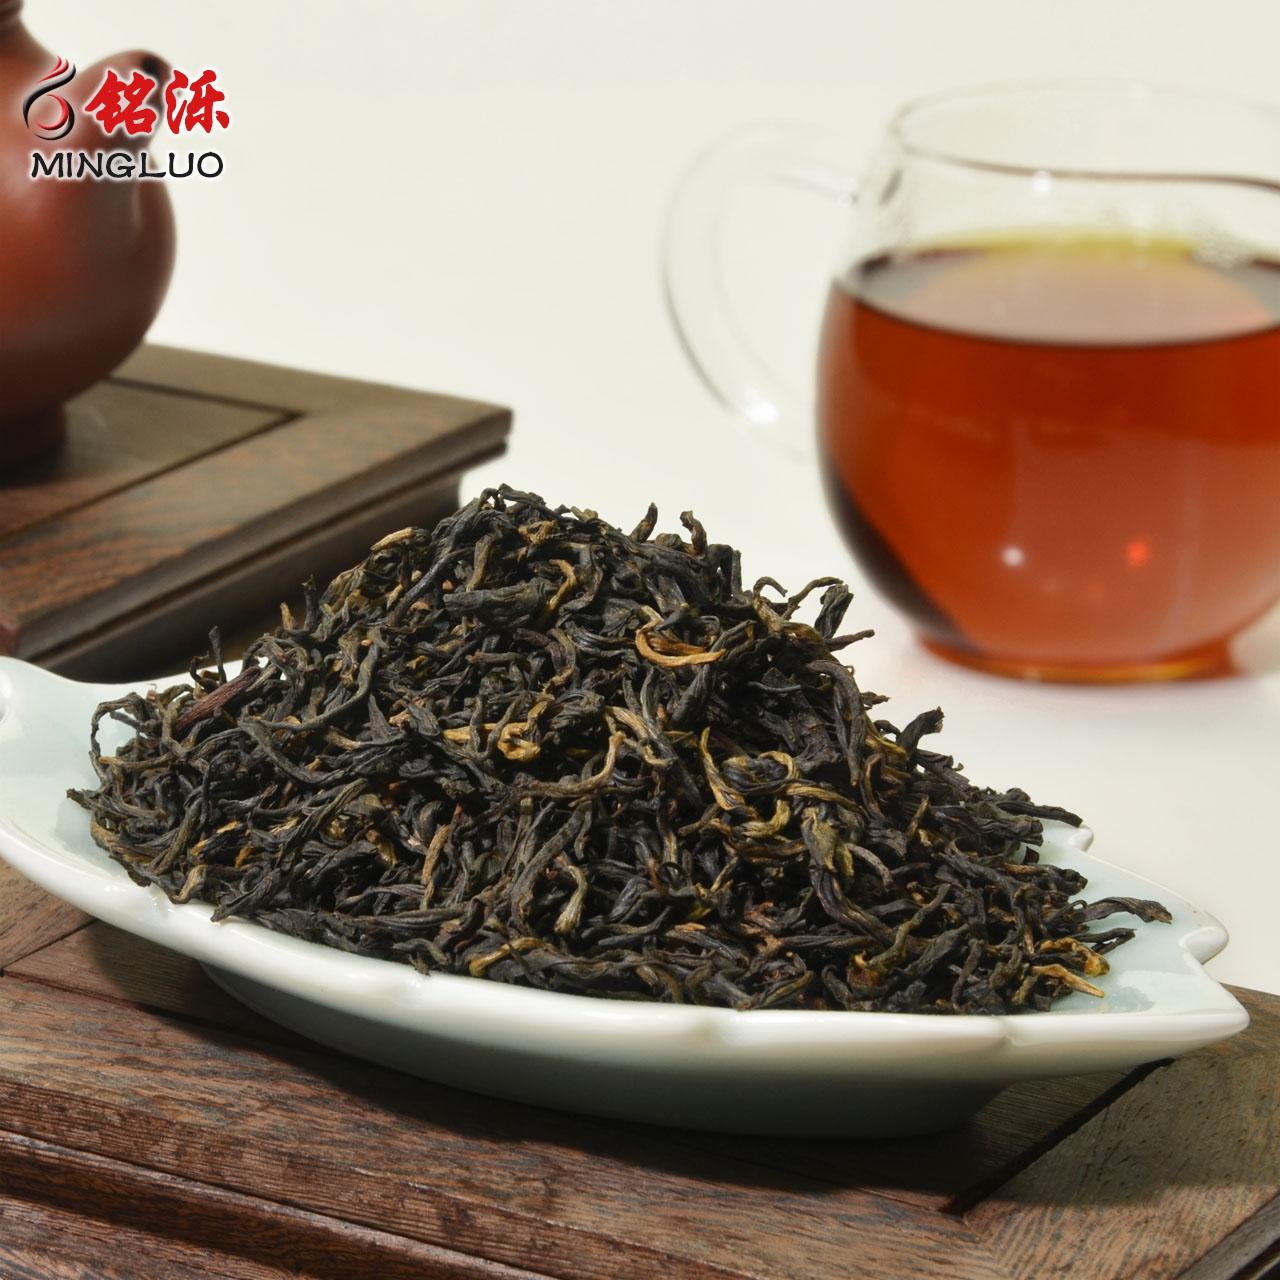 Гаджет  Yunnan dian hong black tea dianhong first level black tea bulk congou black tea 100g for warm stomarch health tea free shipping None Еда